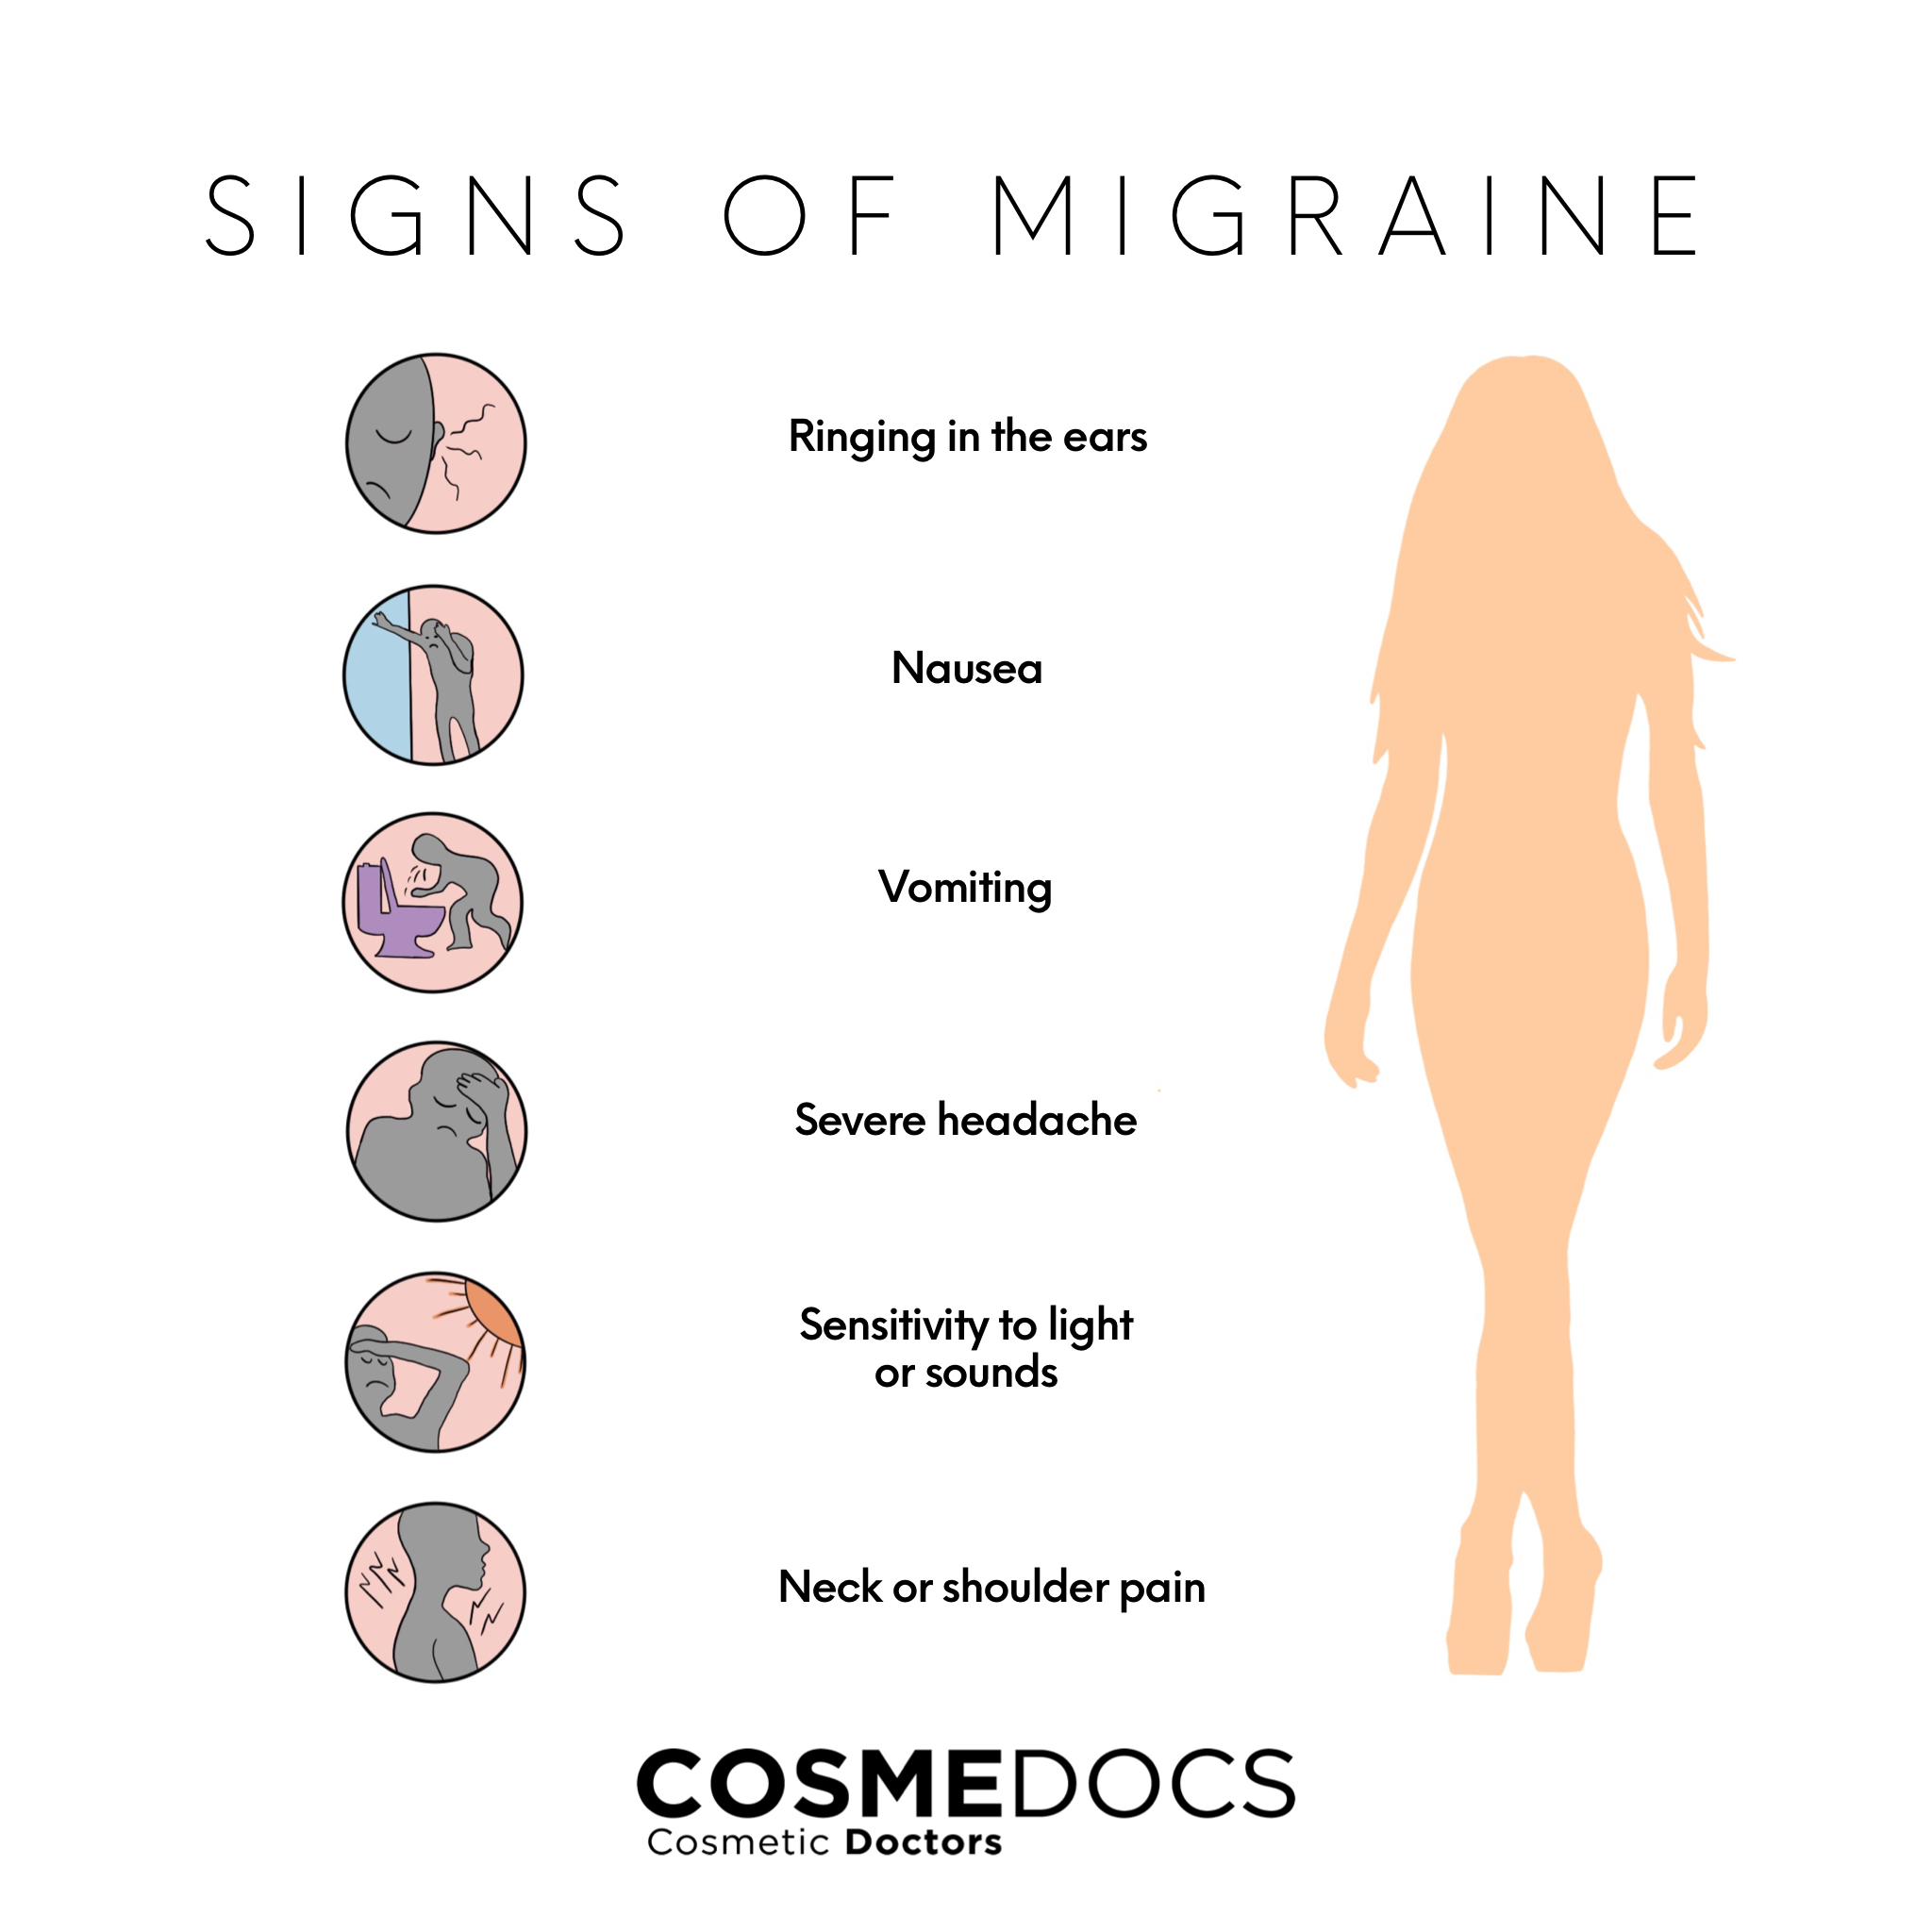 migraine sign and symptom